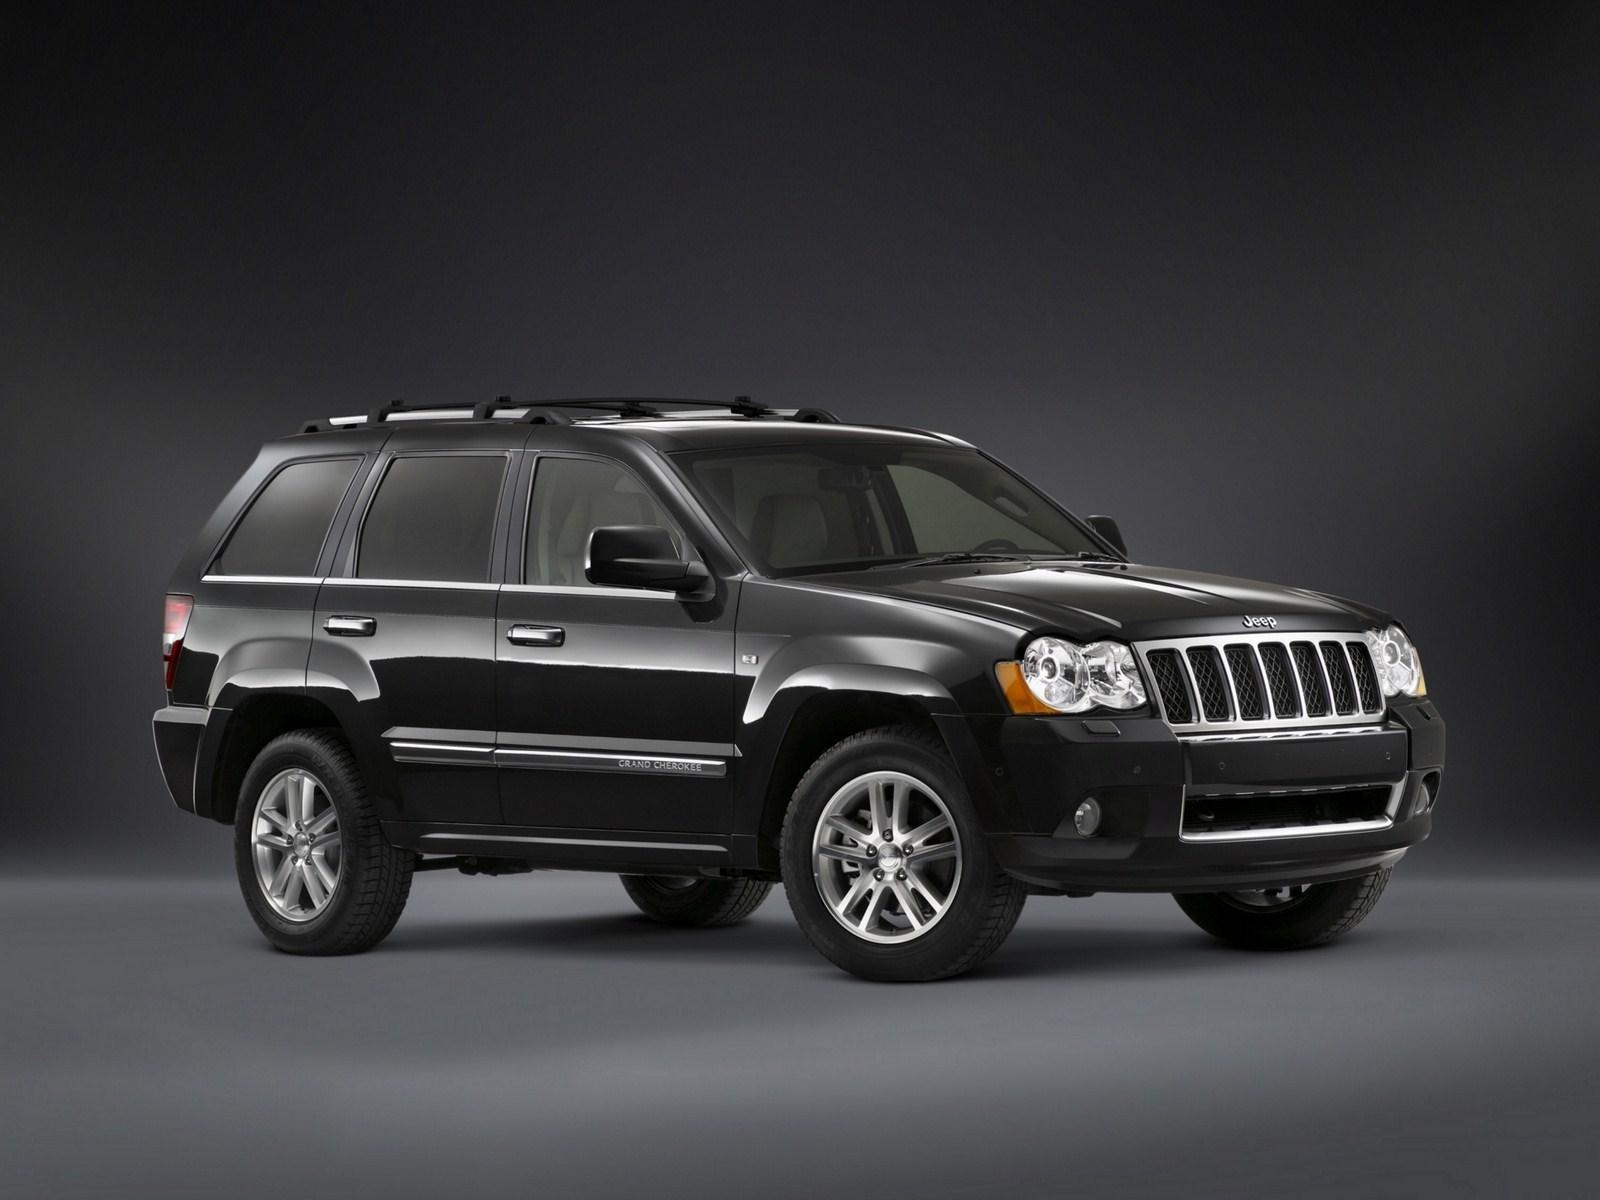 2008-2010. Jeep Grand Cherokee 5.7 Overland (WK)